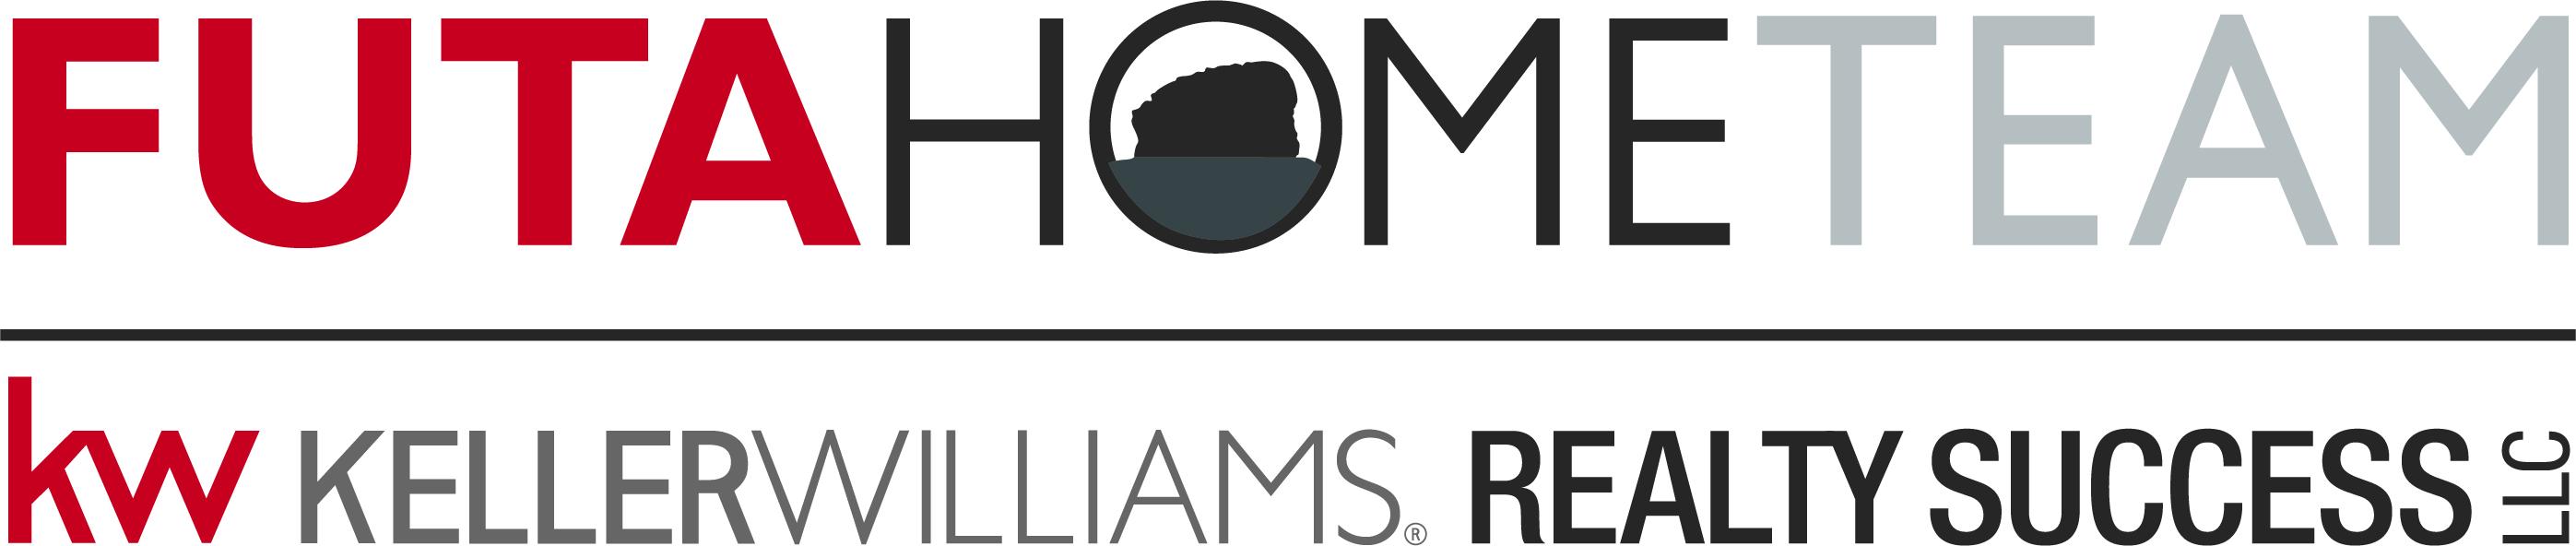 Futa Home Team logo